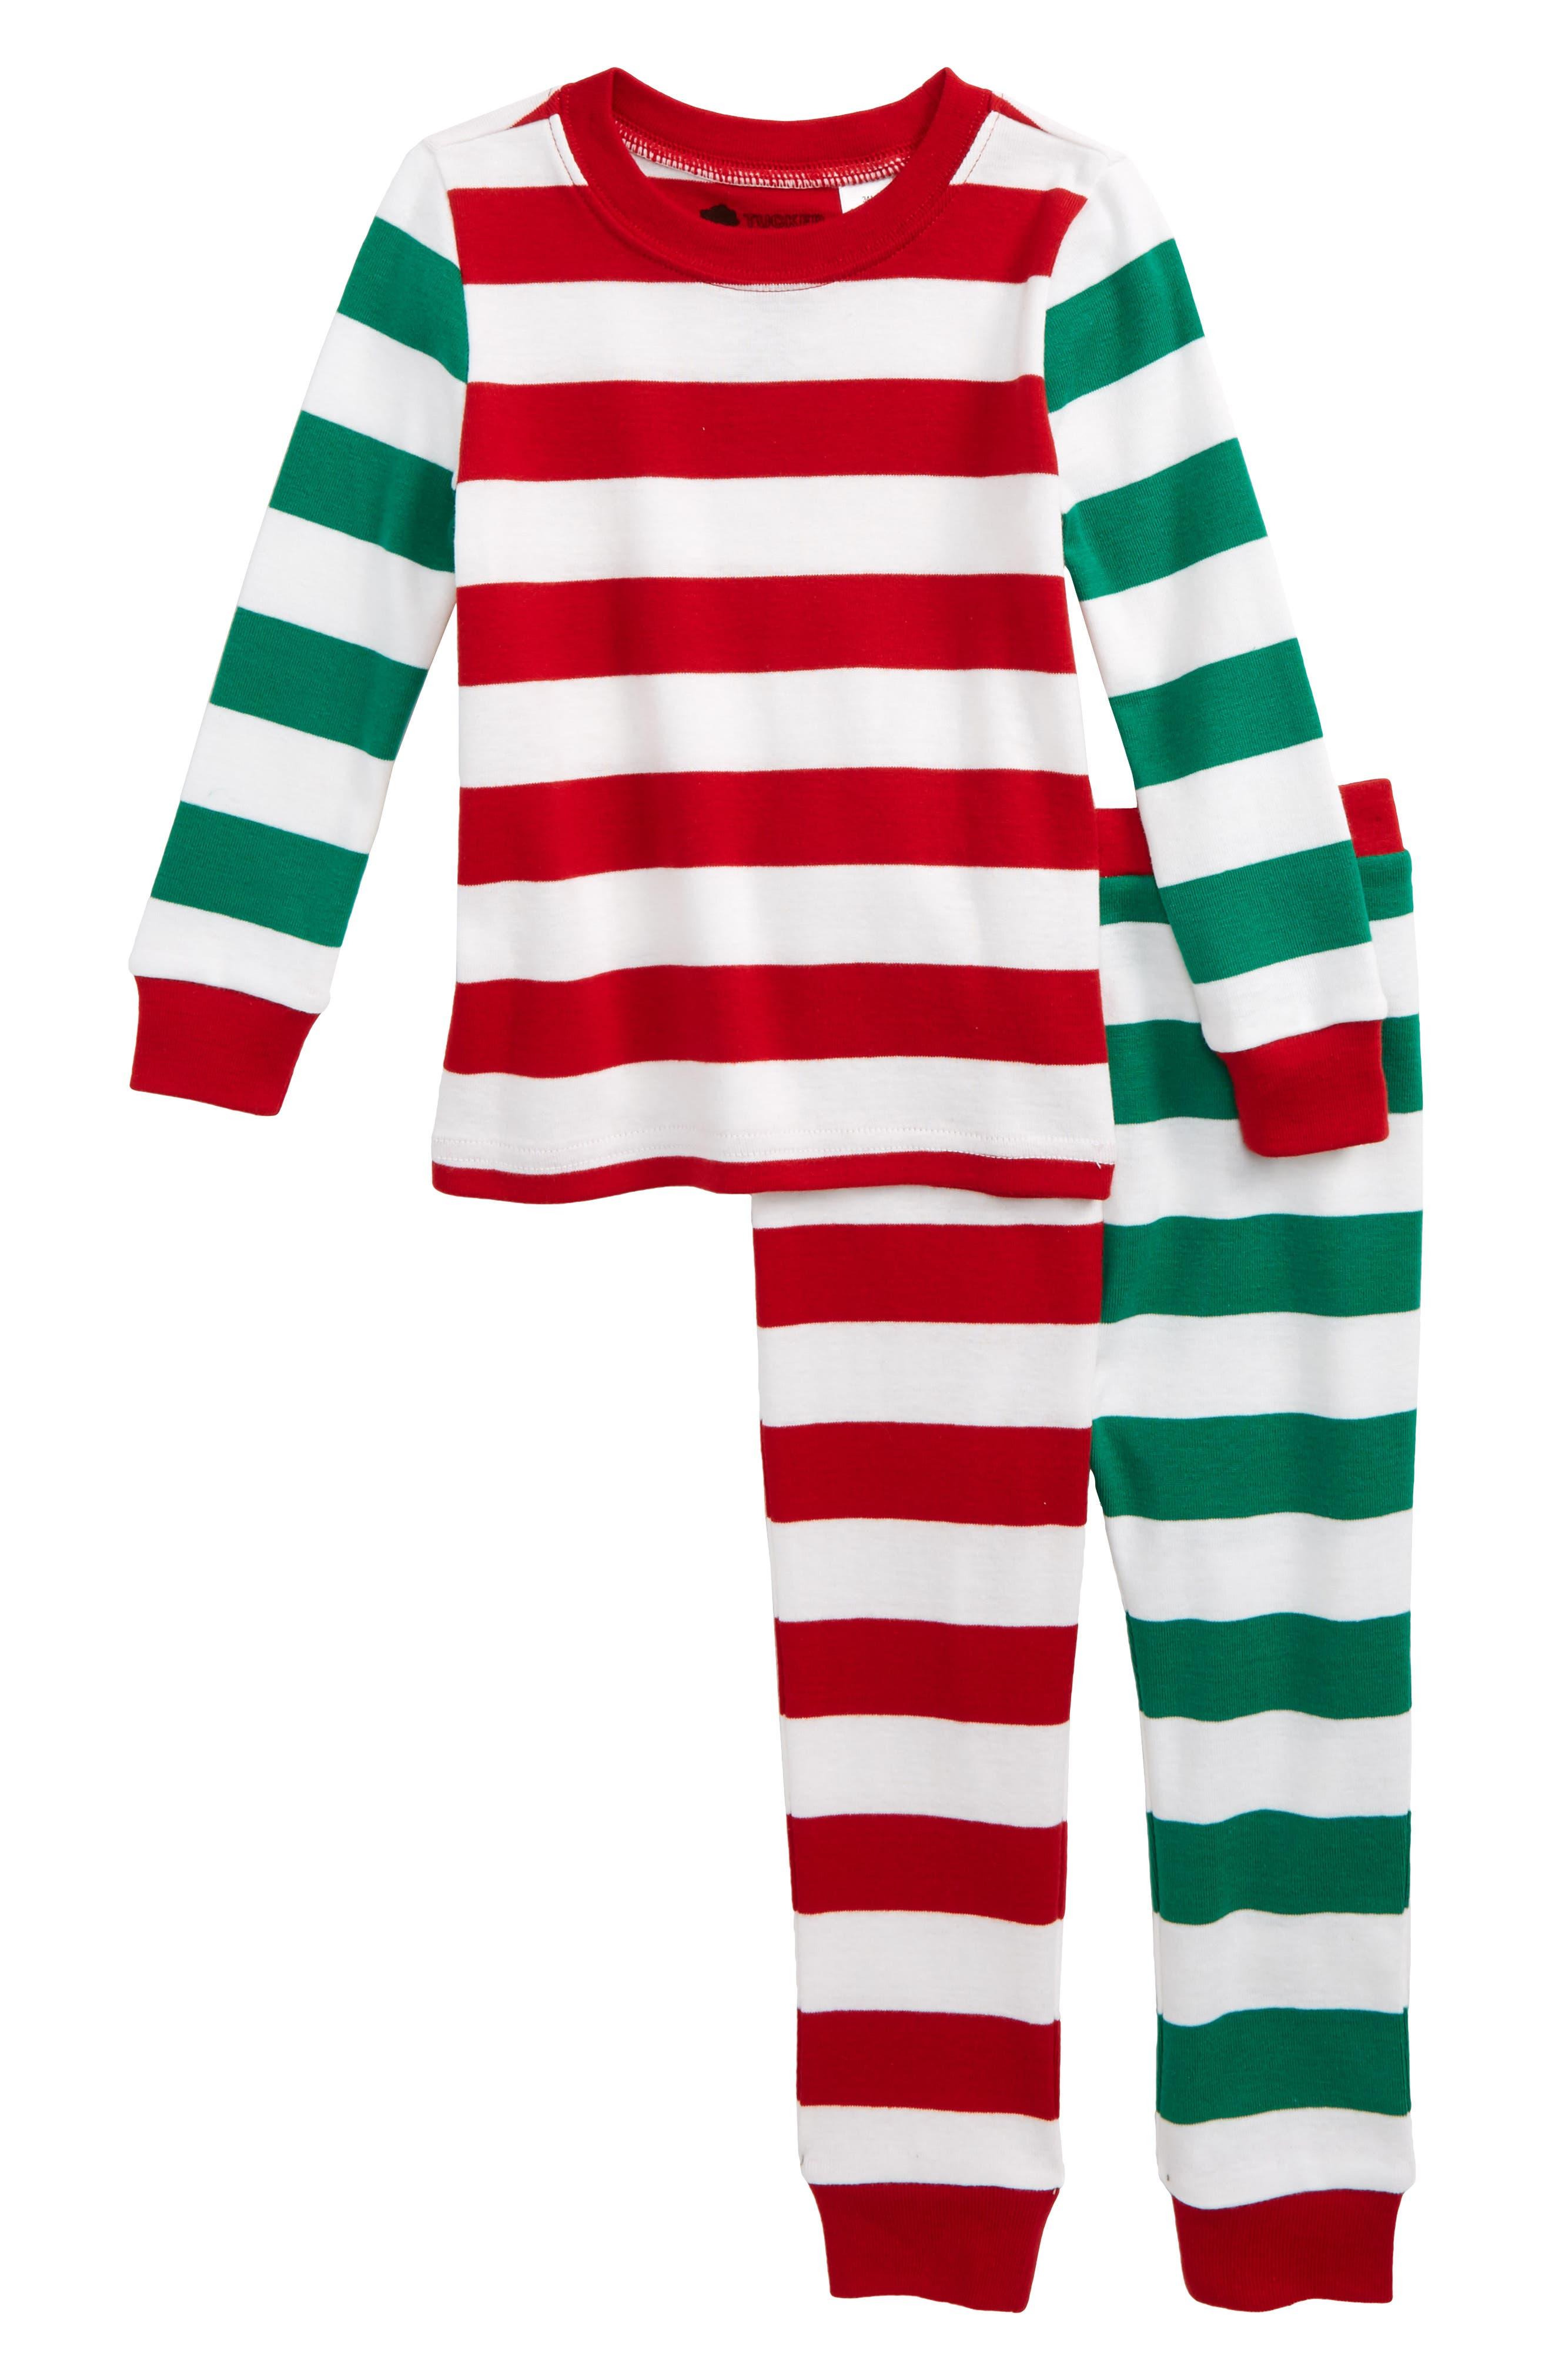 Main Image - Tucker + Tate Fitted Two-Piece Pajamas (Baby Boys)